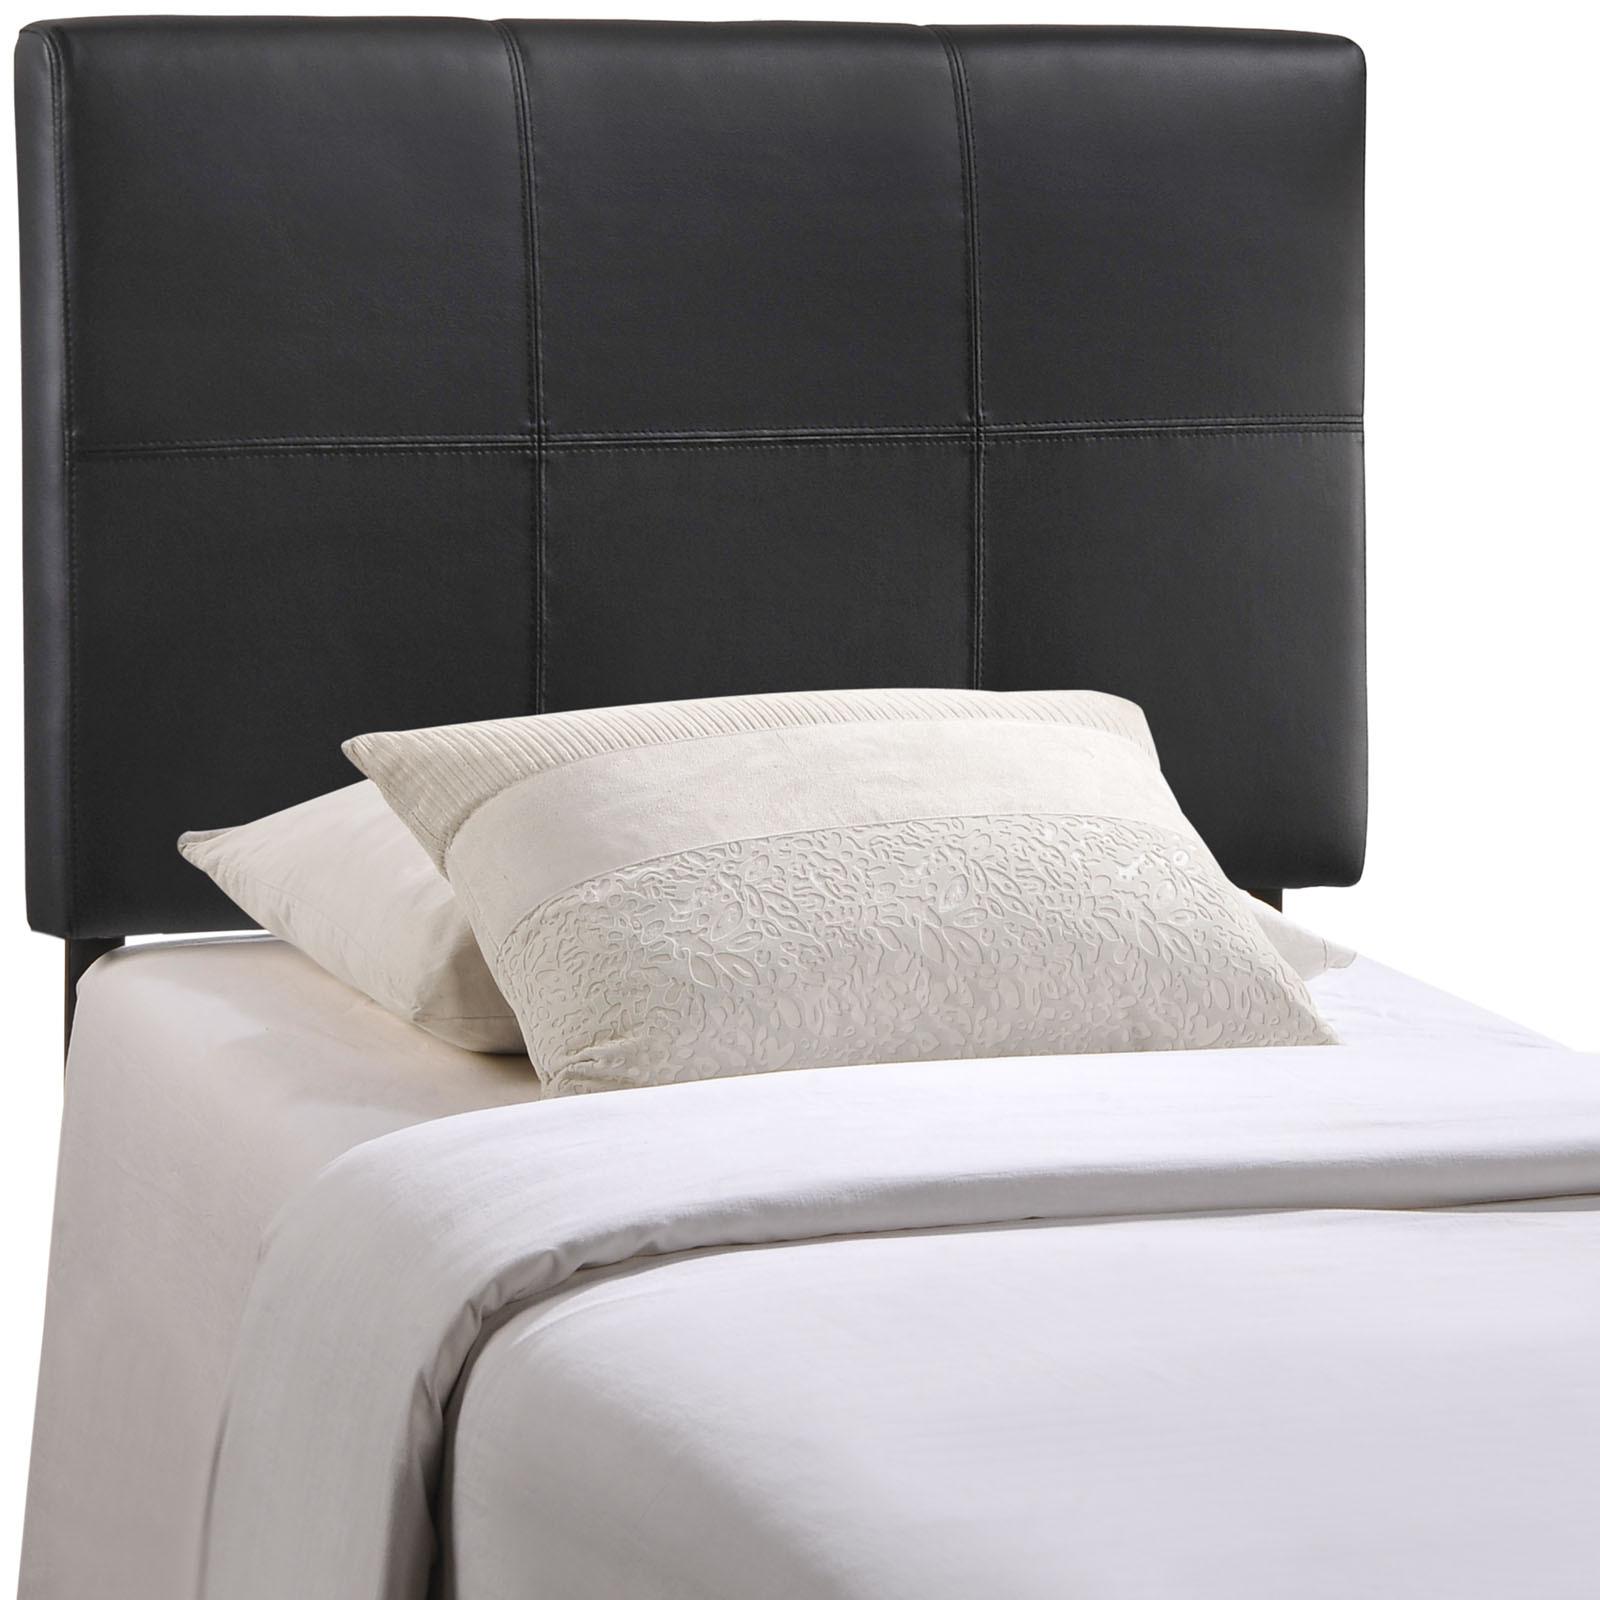 Oliver Black Faux Leather Vinyl Twin Headboard Furniture